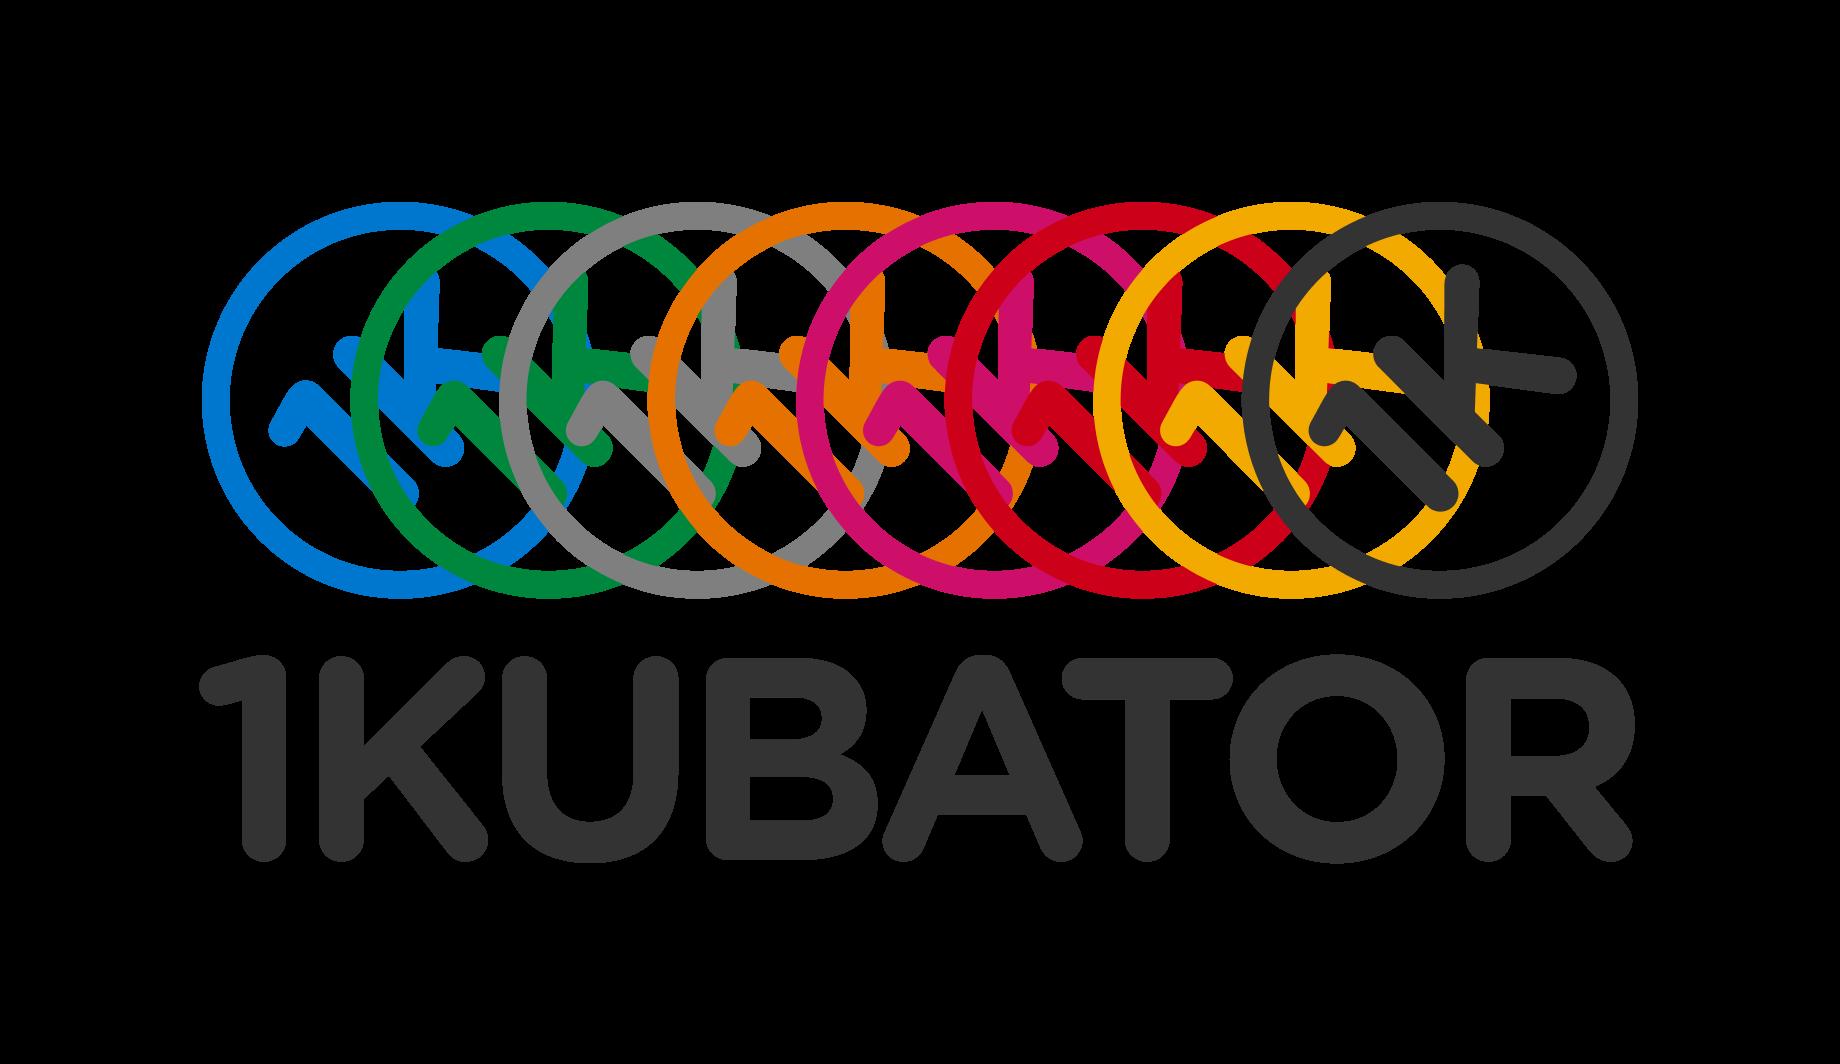 Logo incubateur de startups 1kubator